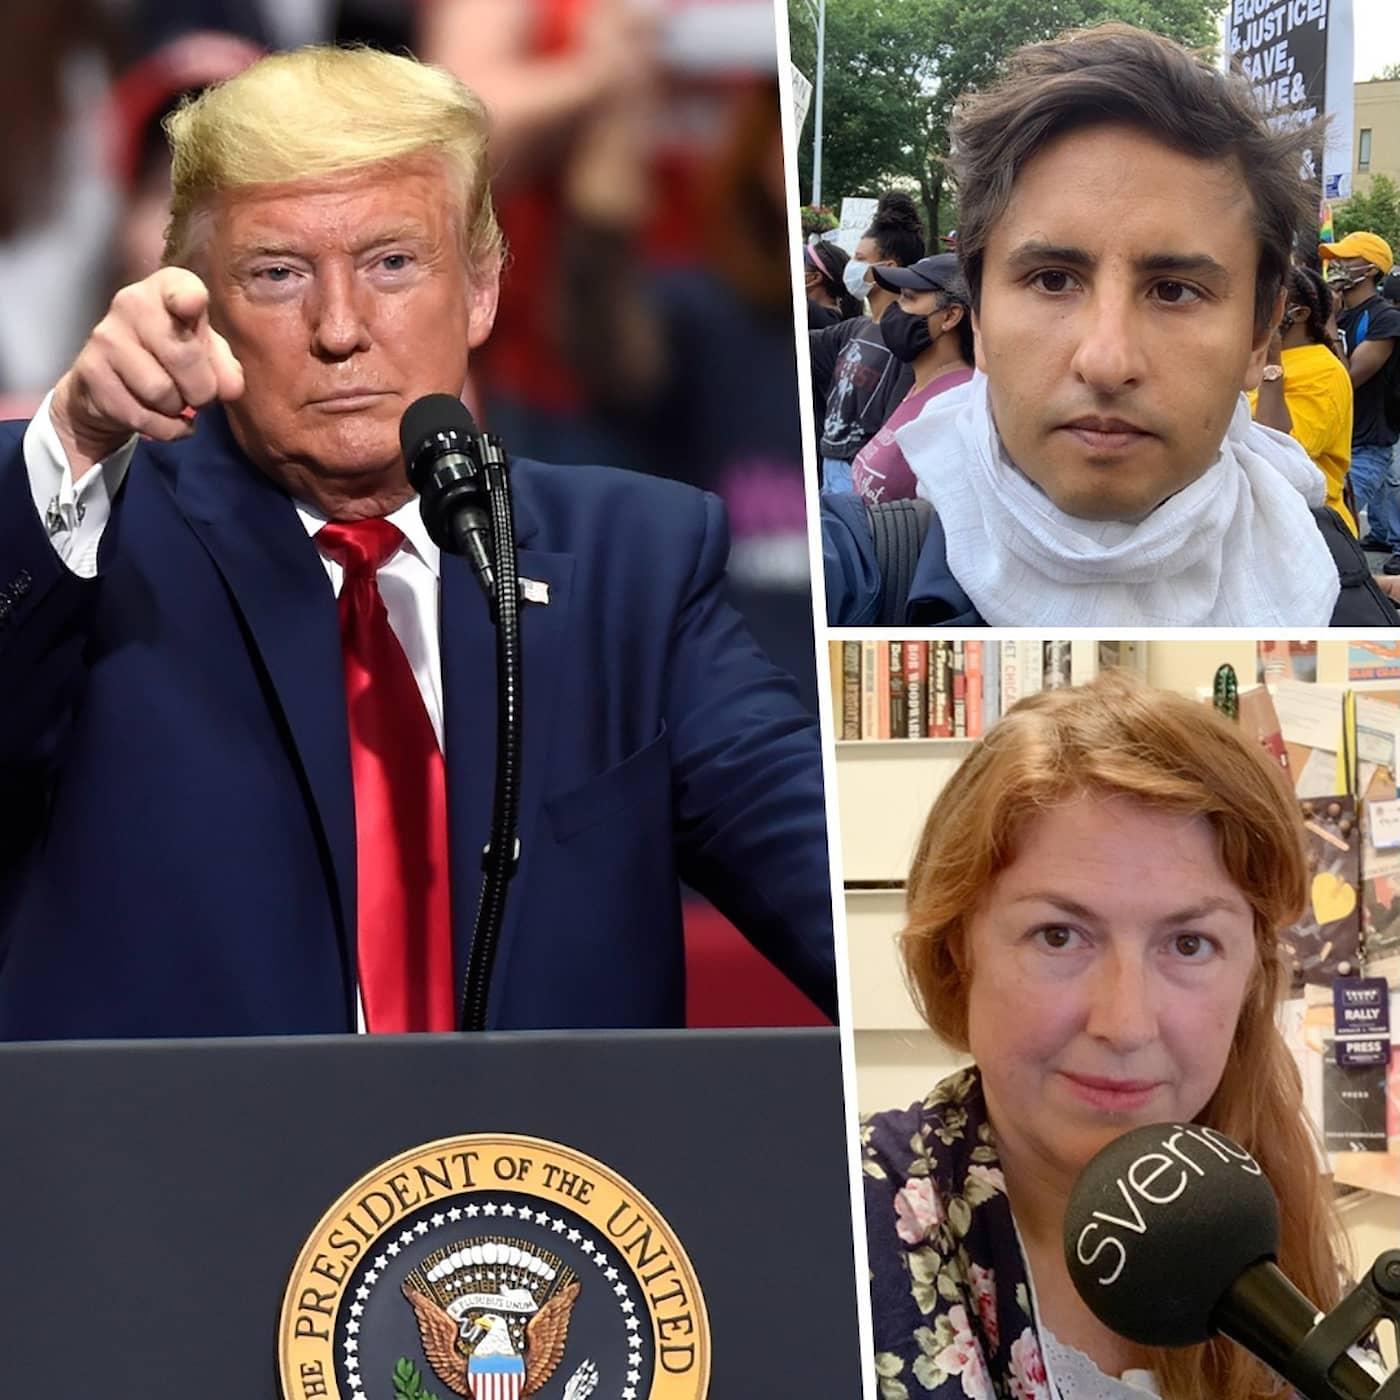 Nedrivna statyer och Trumps coronatrots